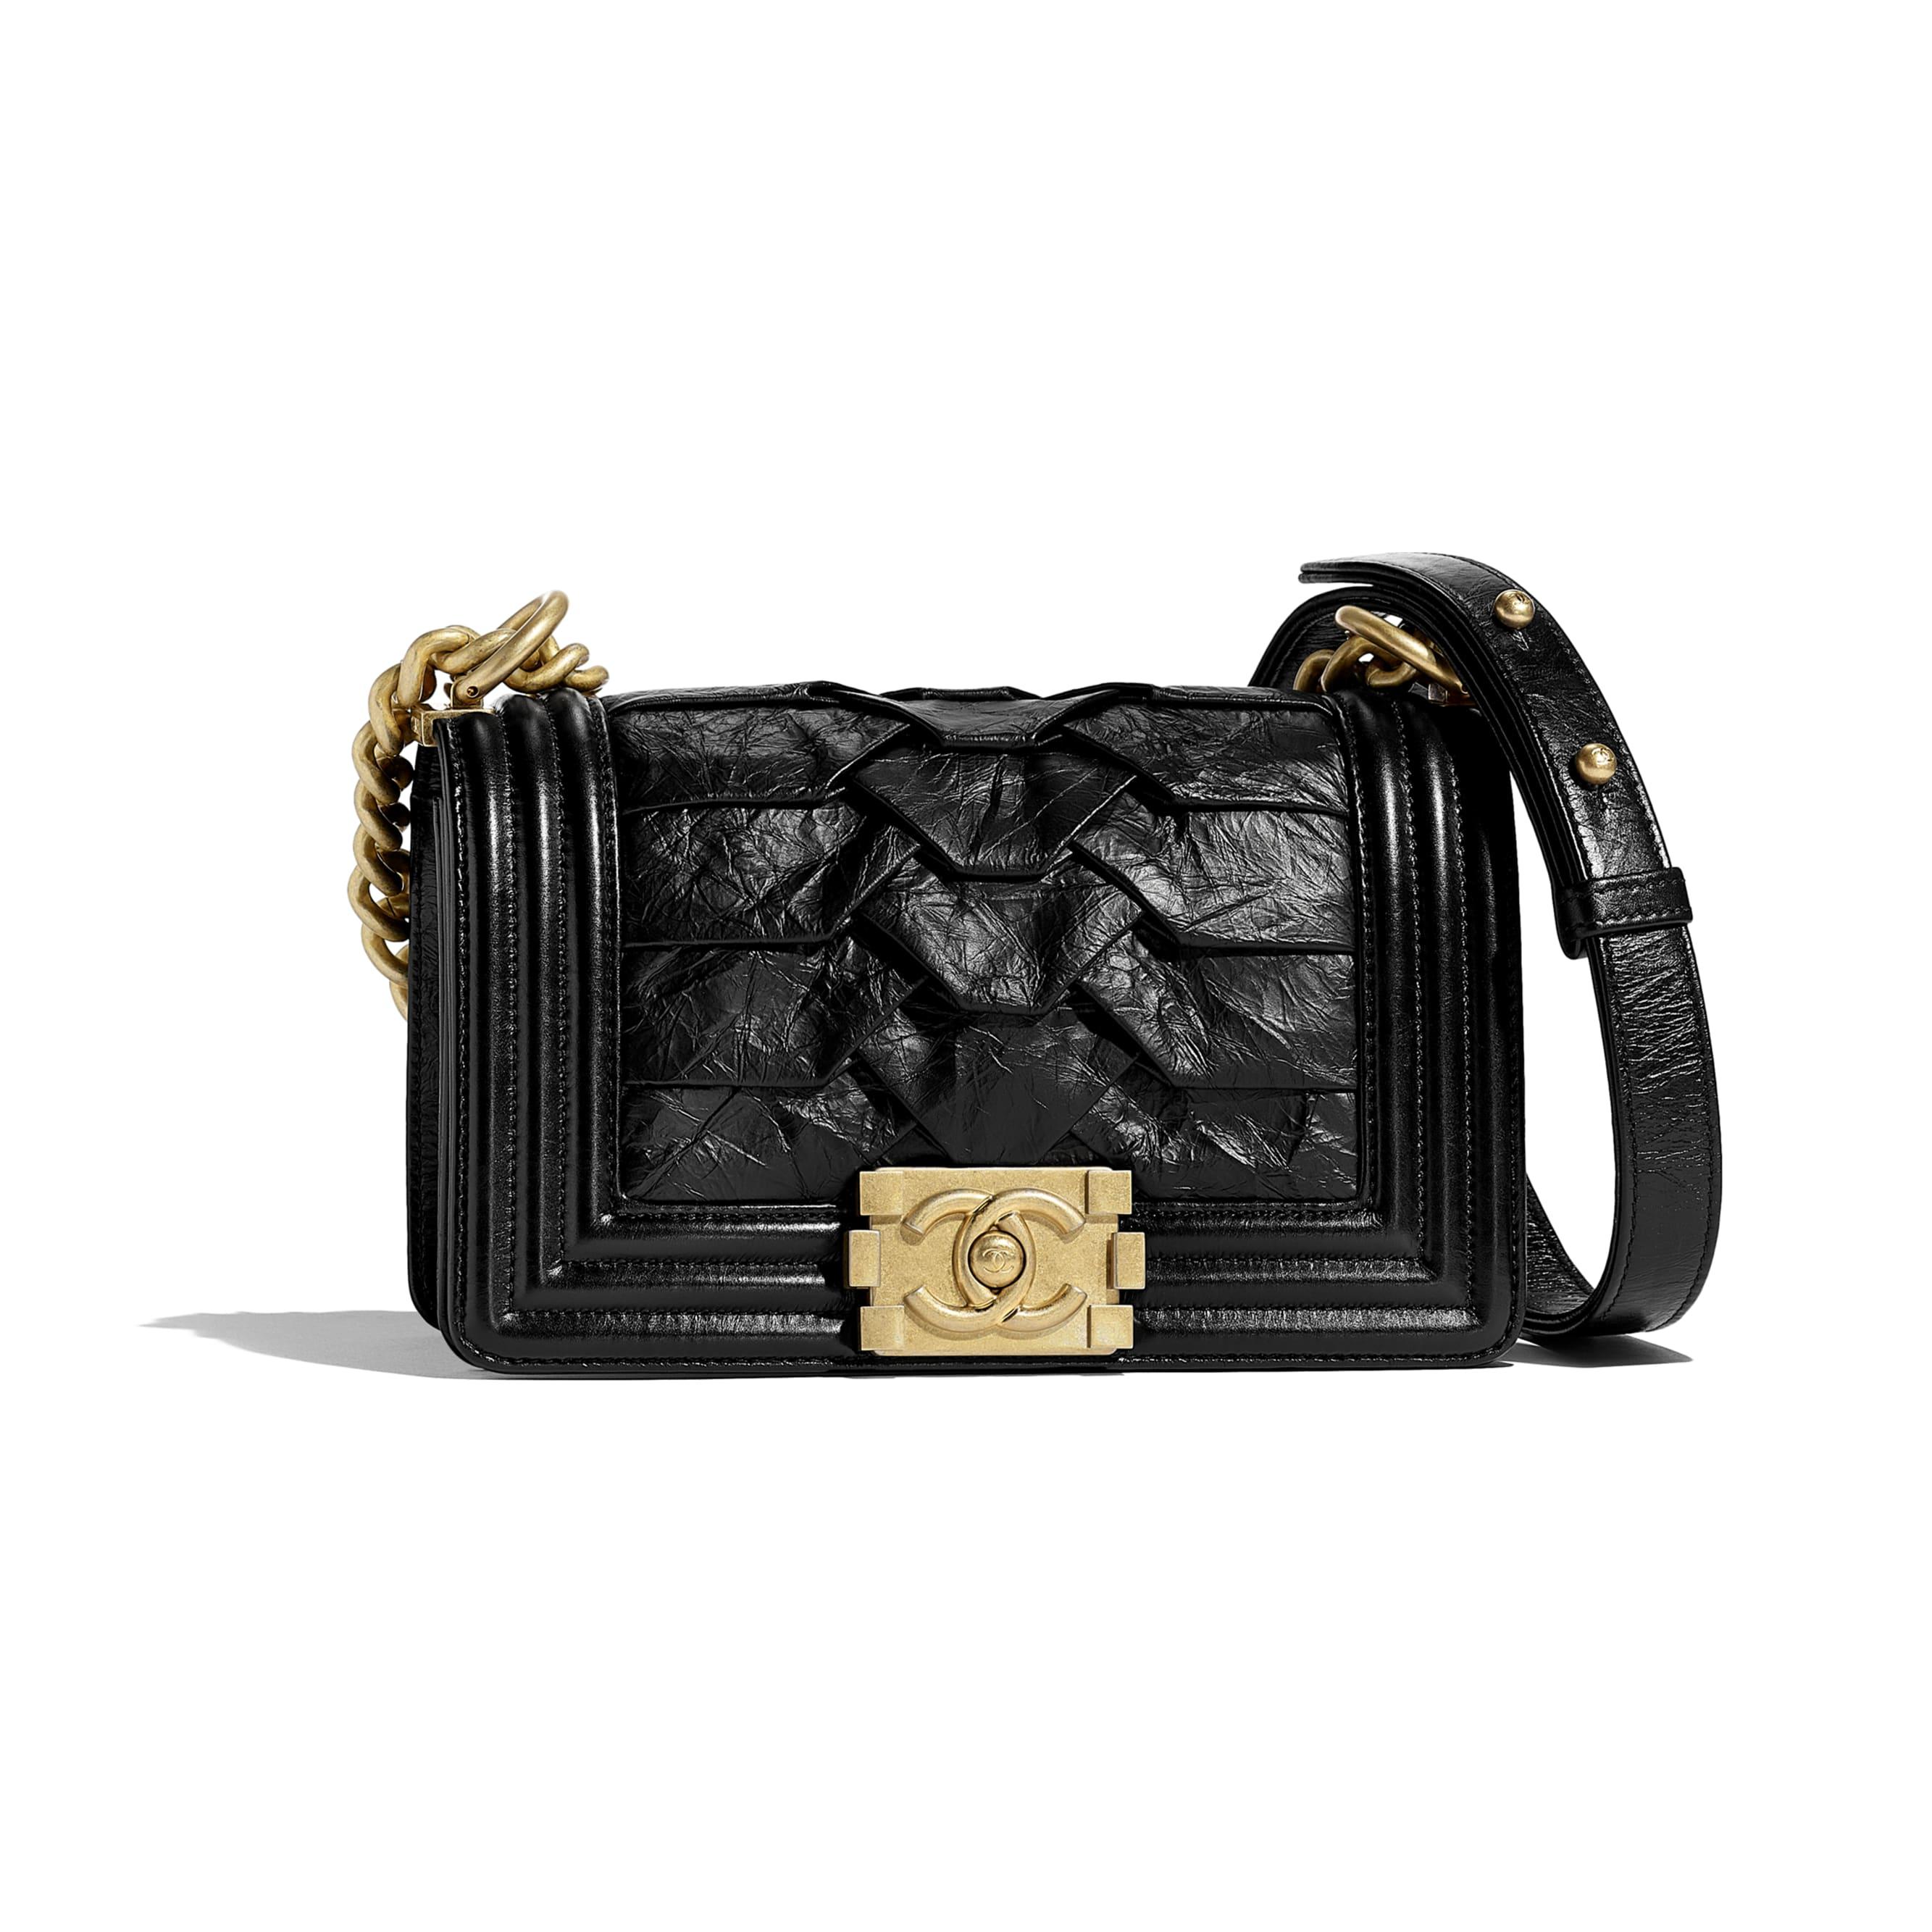 Small BOY CHANEL Handbag - Black - Crumpled Calfskin & Gold-Tone Metal - Default view - see standard sized version